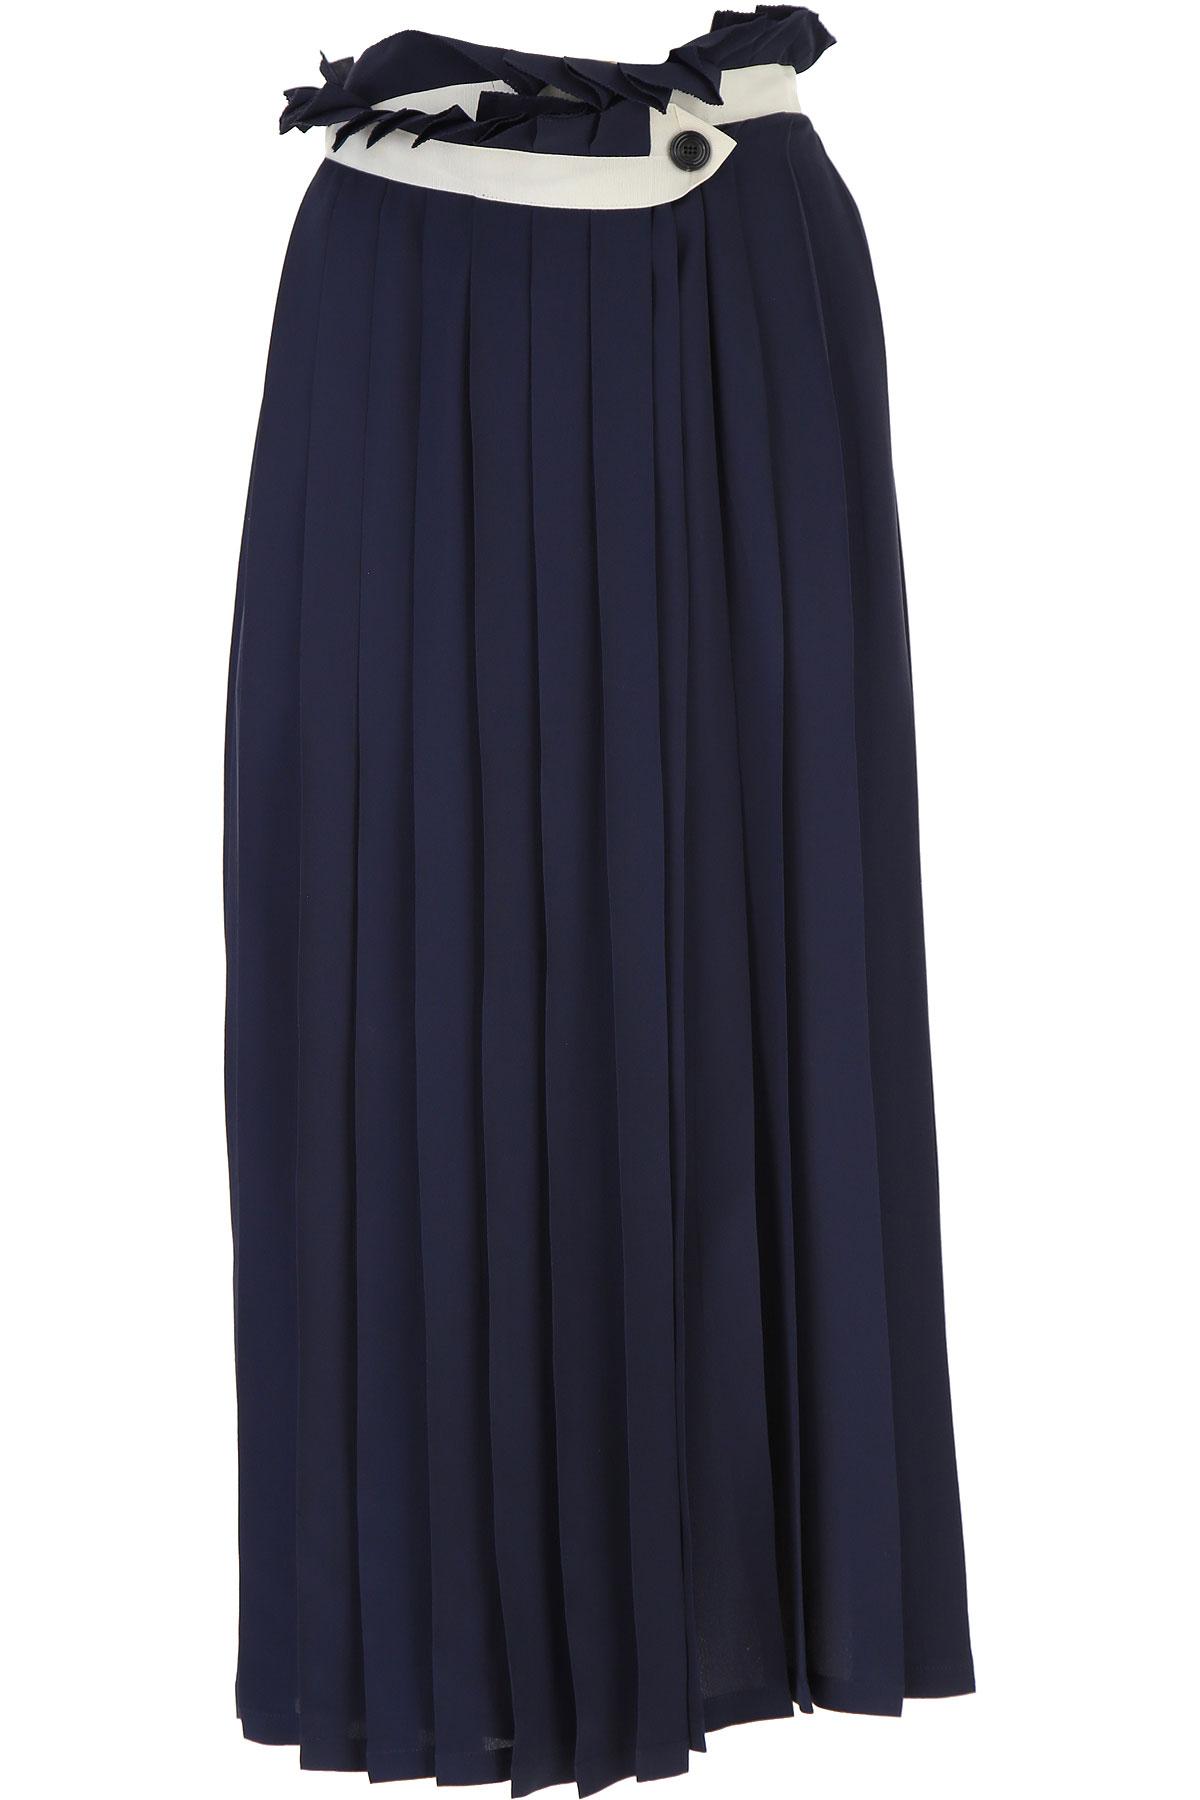 Golden Goose Skirt for Women On Sale, Navy Blue, acetate, 2019, XS (IT 38) S (IT 40) M (IT 42 )